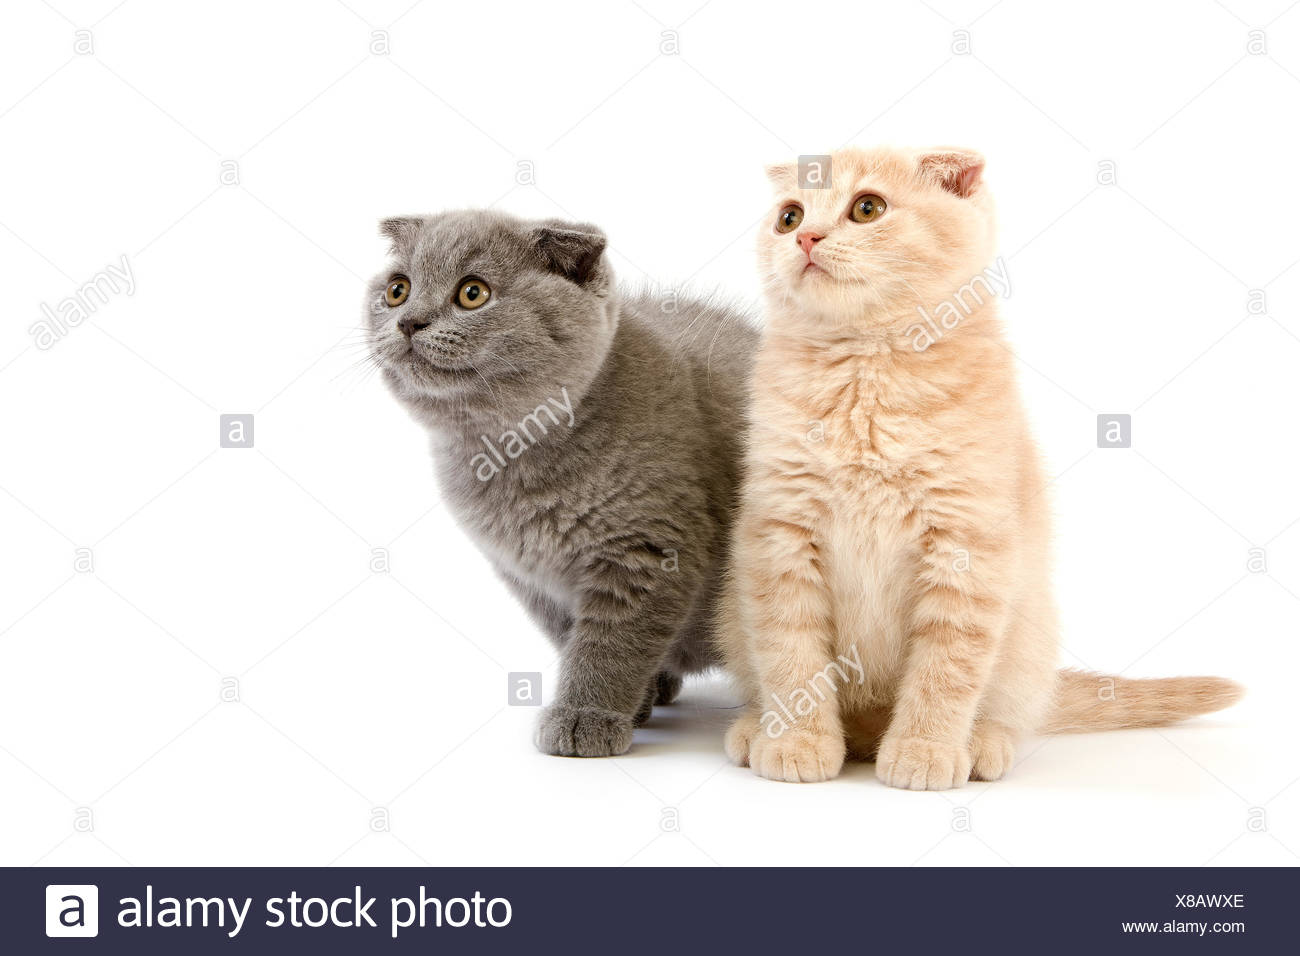 Blue Scottish Fold Domestic Cat, Cream Scottish Fold, Black Tortoise-Shell British Shorthair and Black British Shorthair, 2 Months Old Kittens - Stock Image